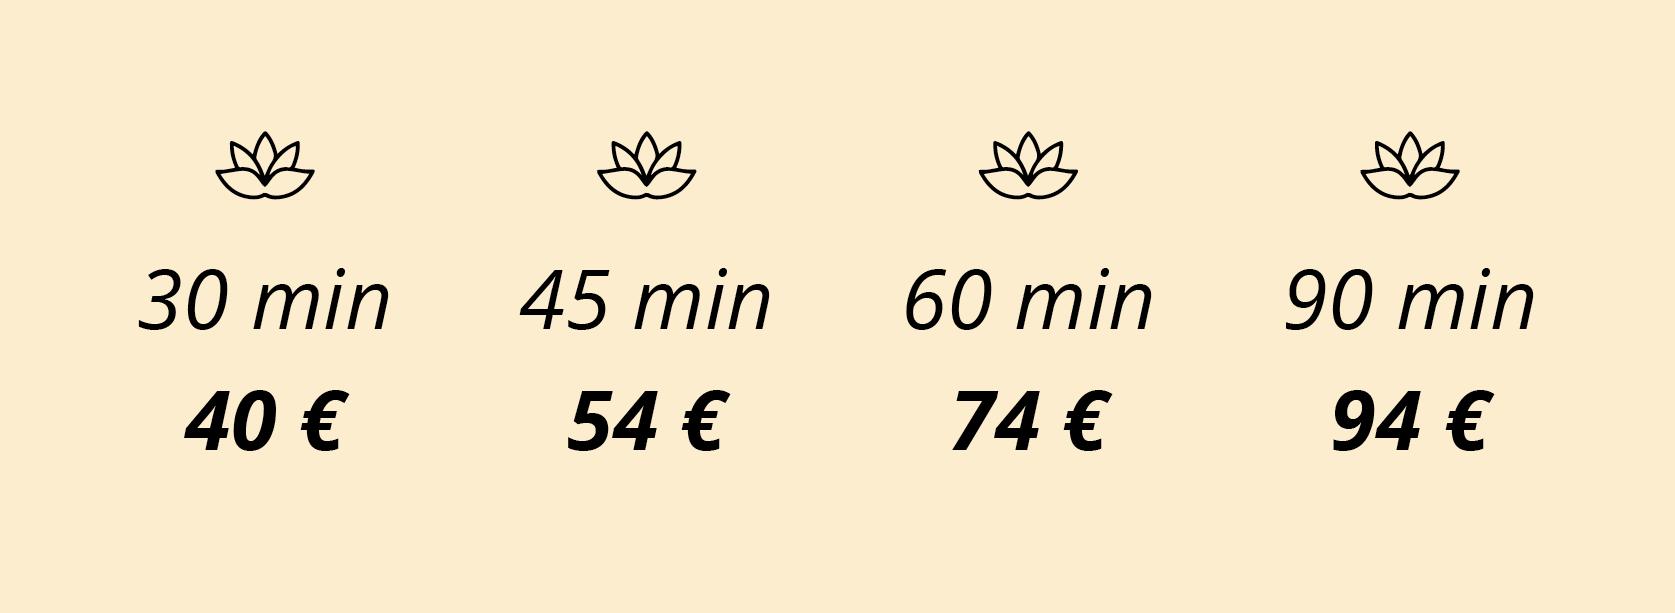 nebo massage for 2 price